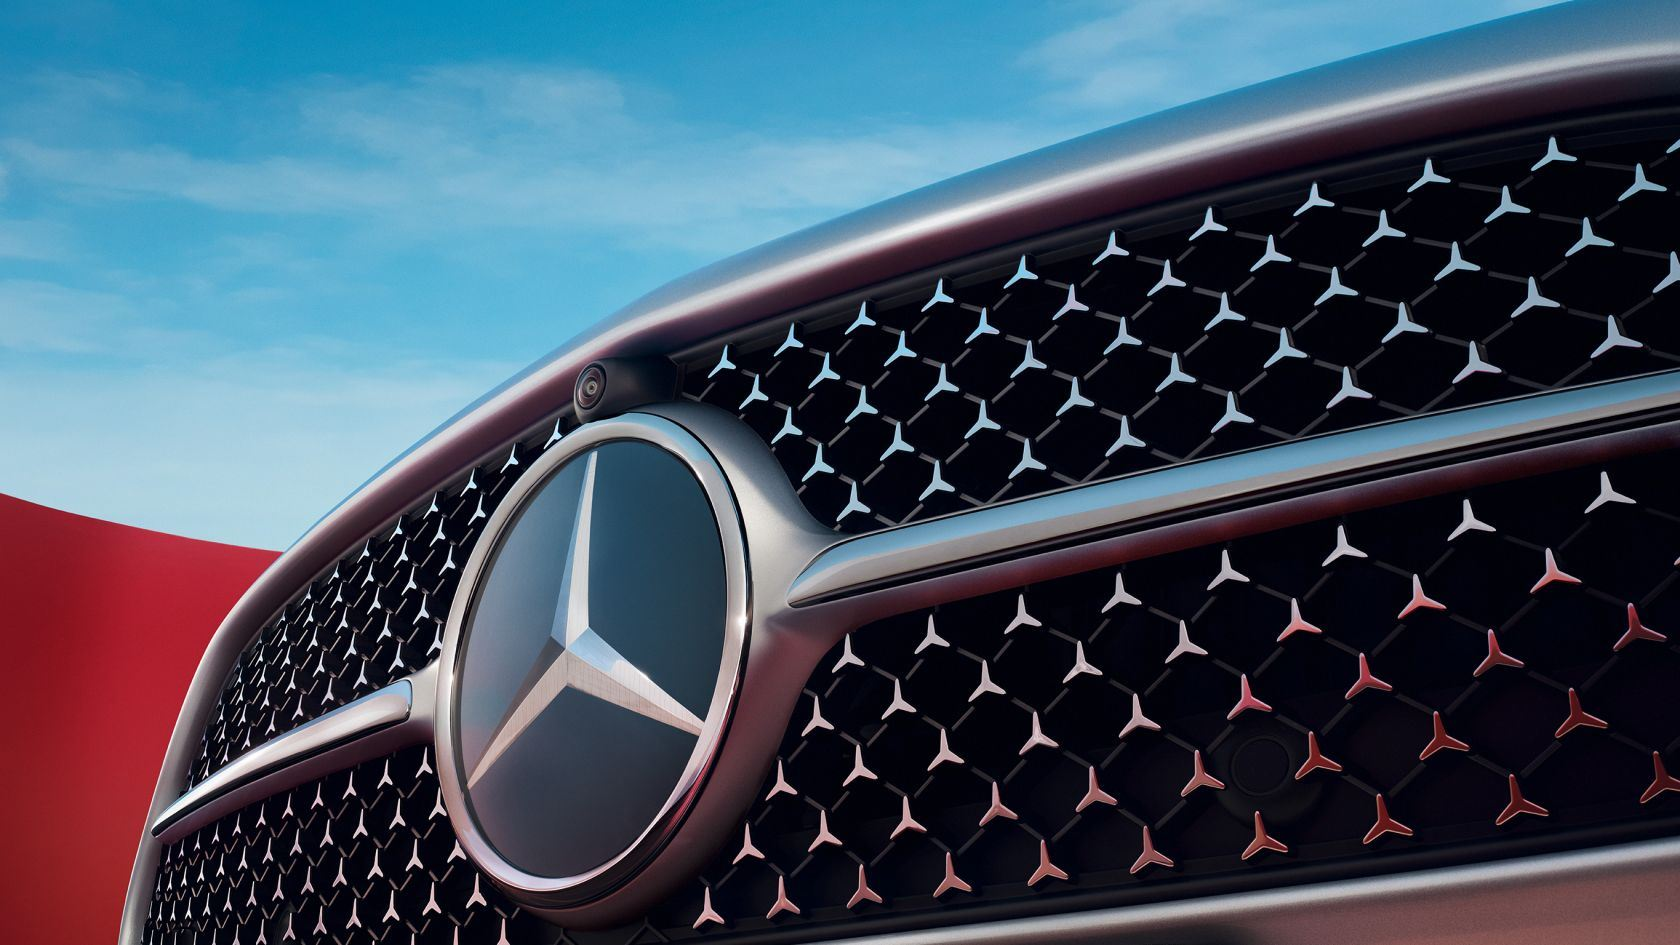 Mercedes C-Klasse 2021 AMG Grill